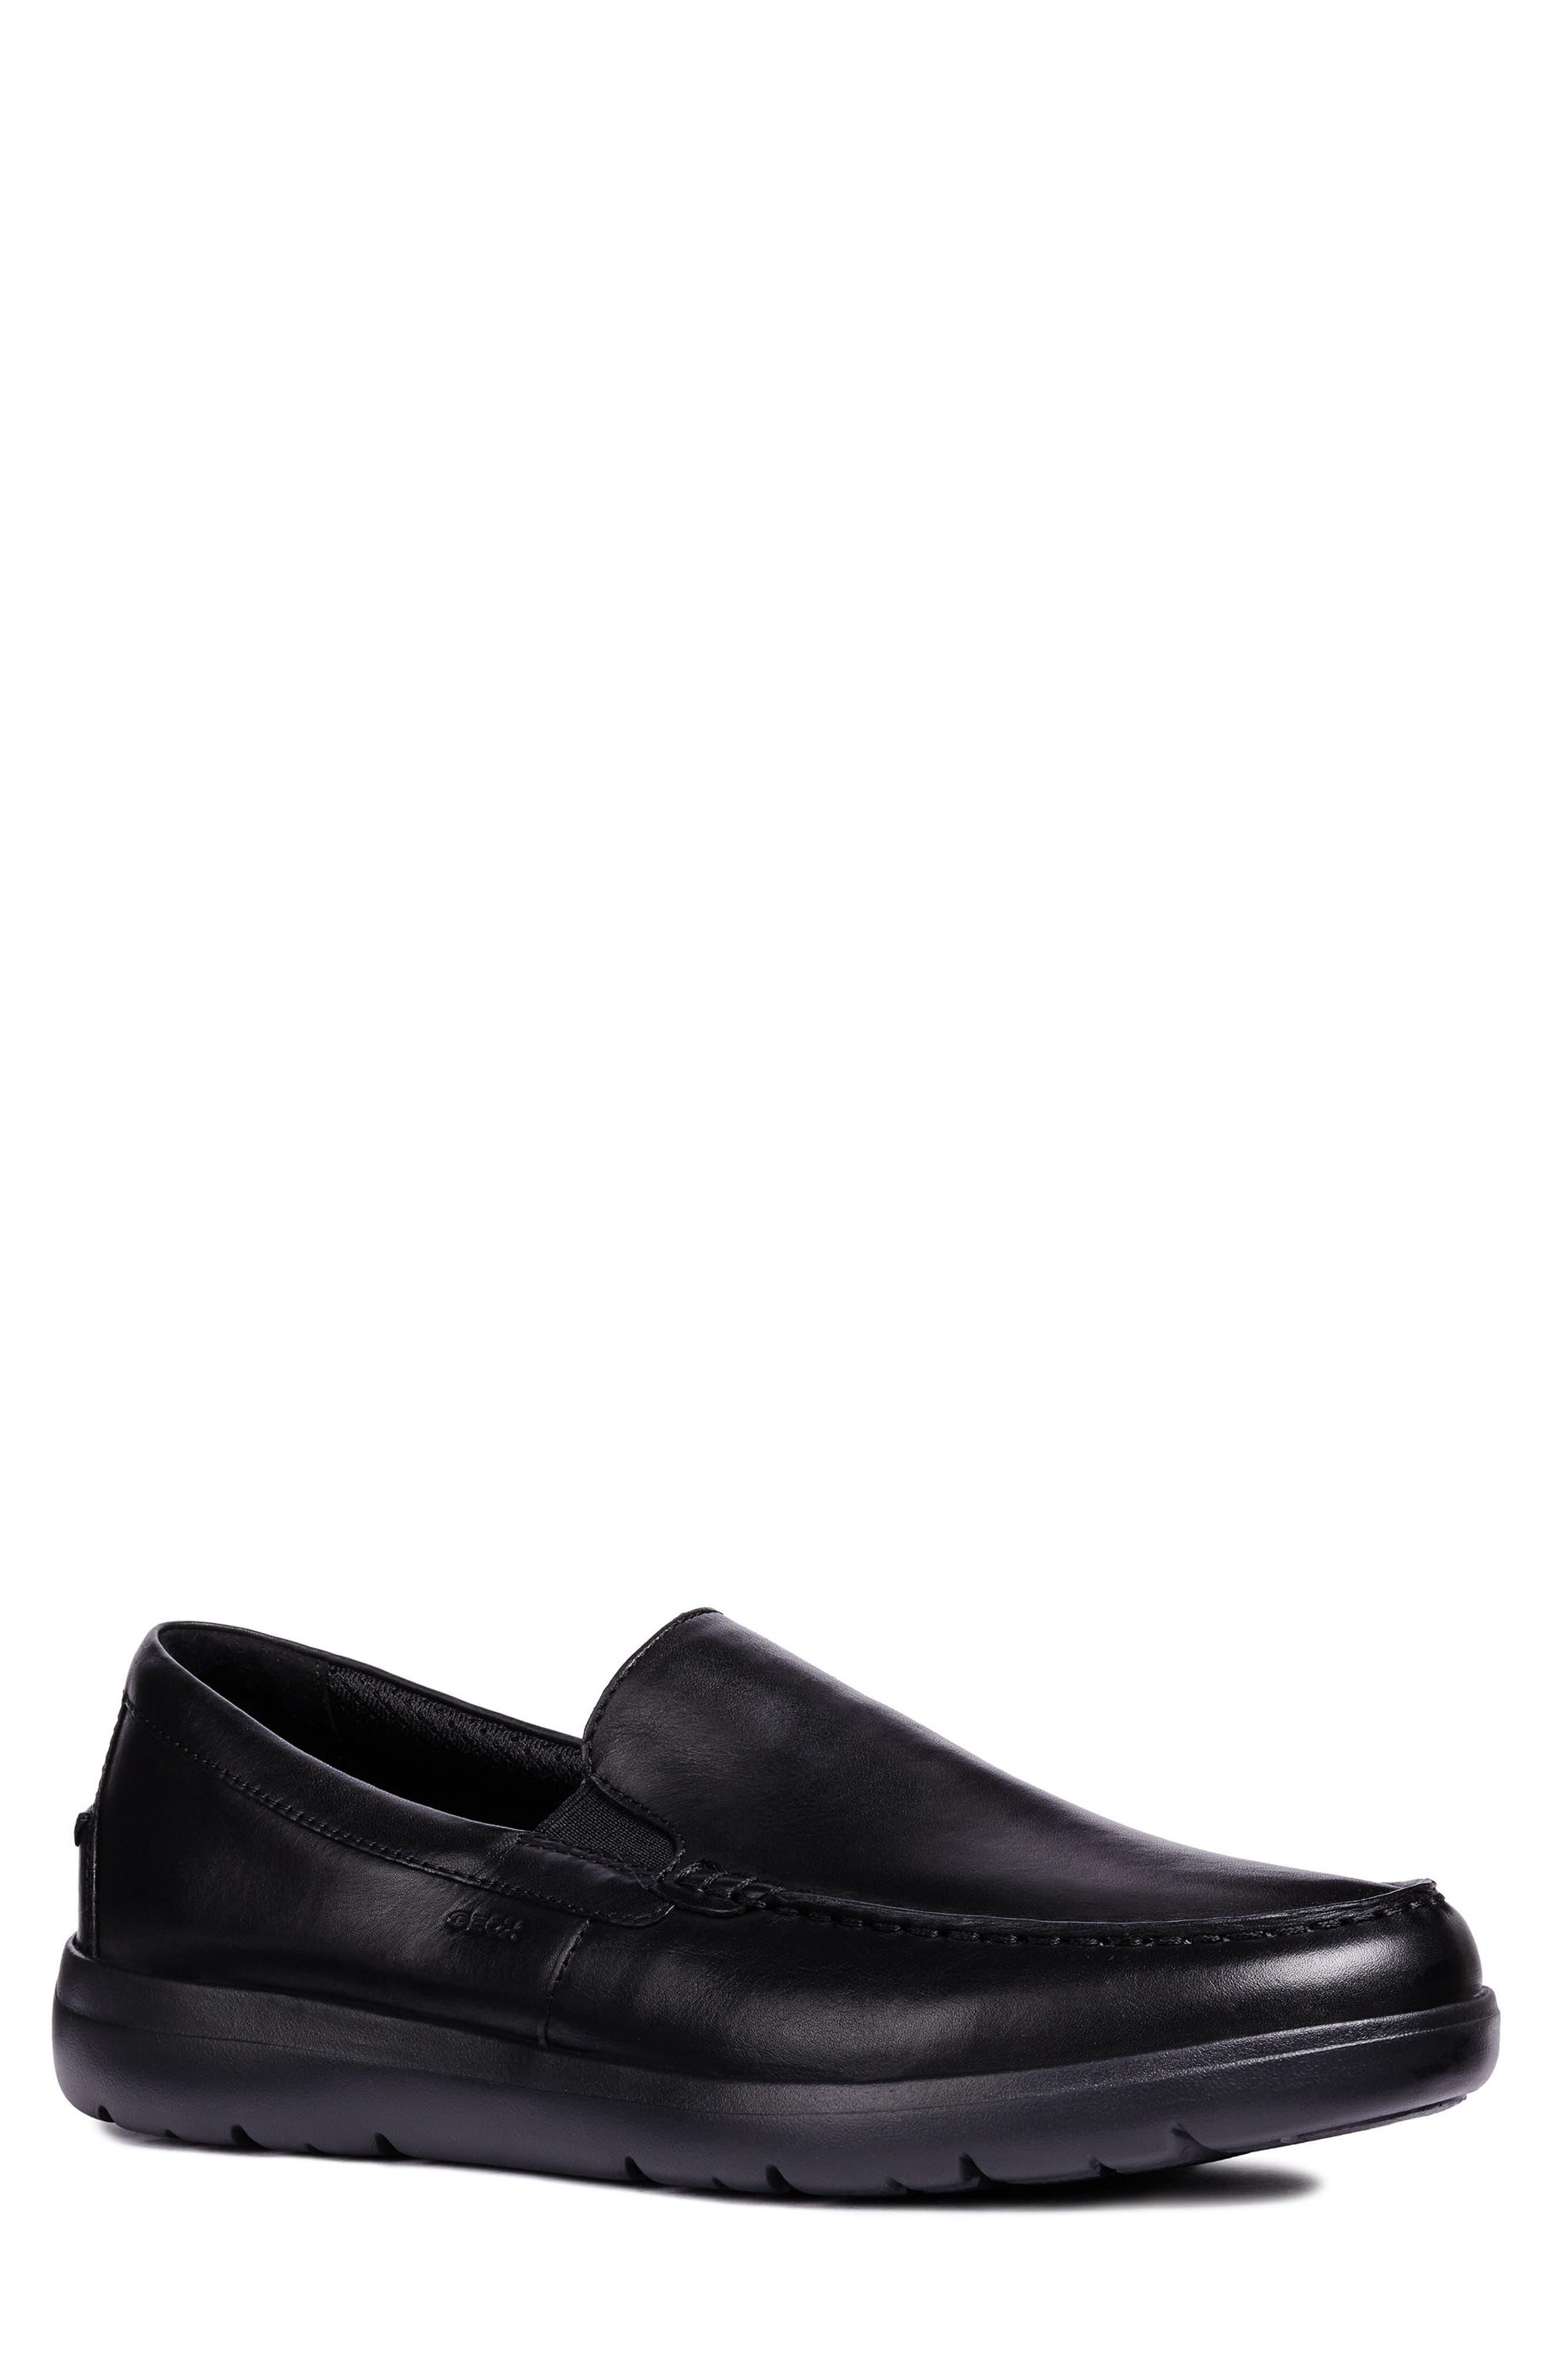 Leitan 6 Moc Toe Slip-On,                         Main,                         color, BLACK LEATHER